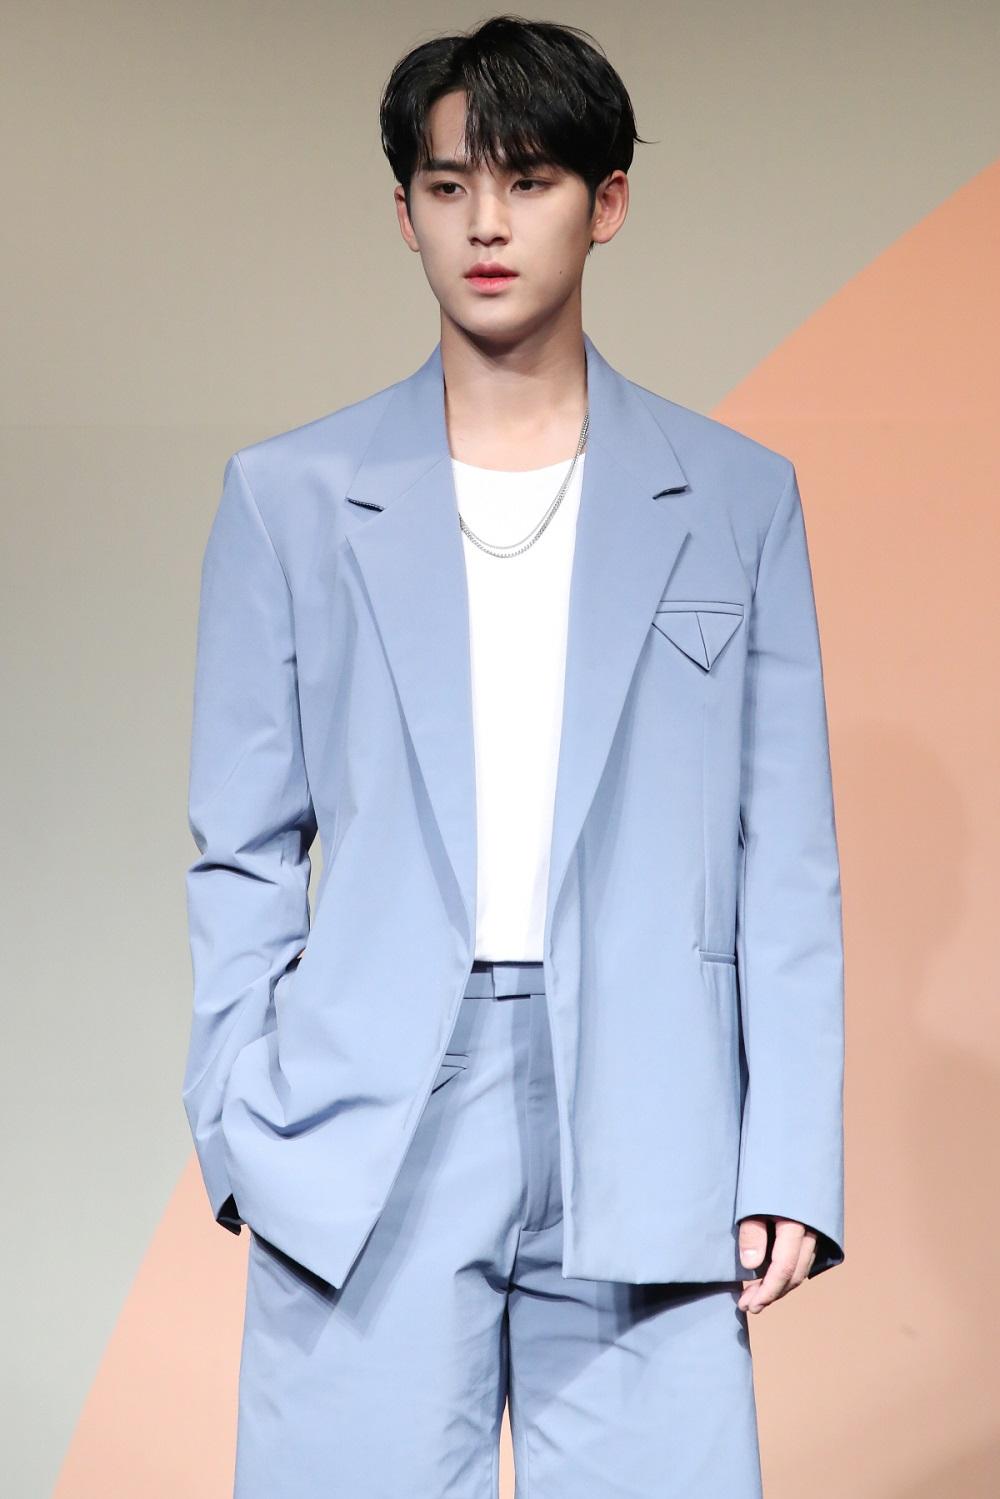 seventeen-mingyu-apologizes-again-at-henggarae-showcase-for-itaewon-controversy-2